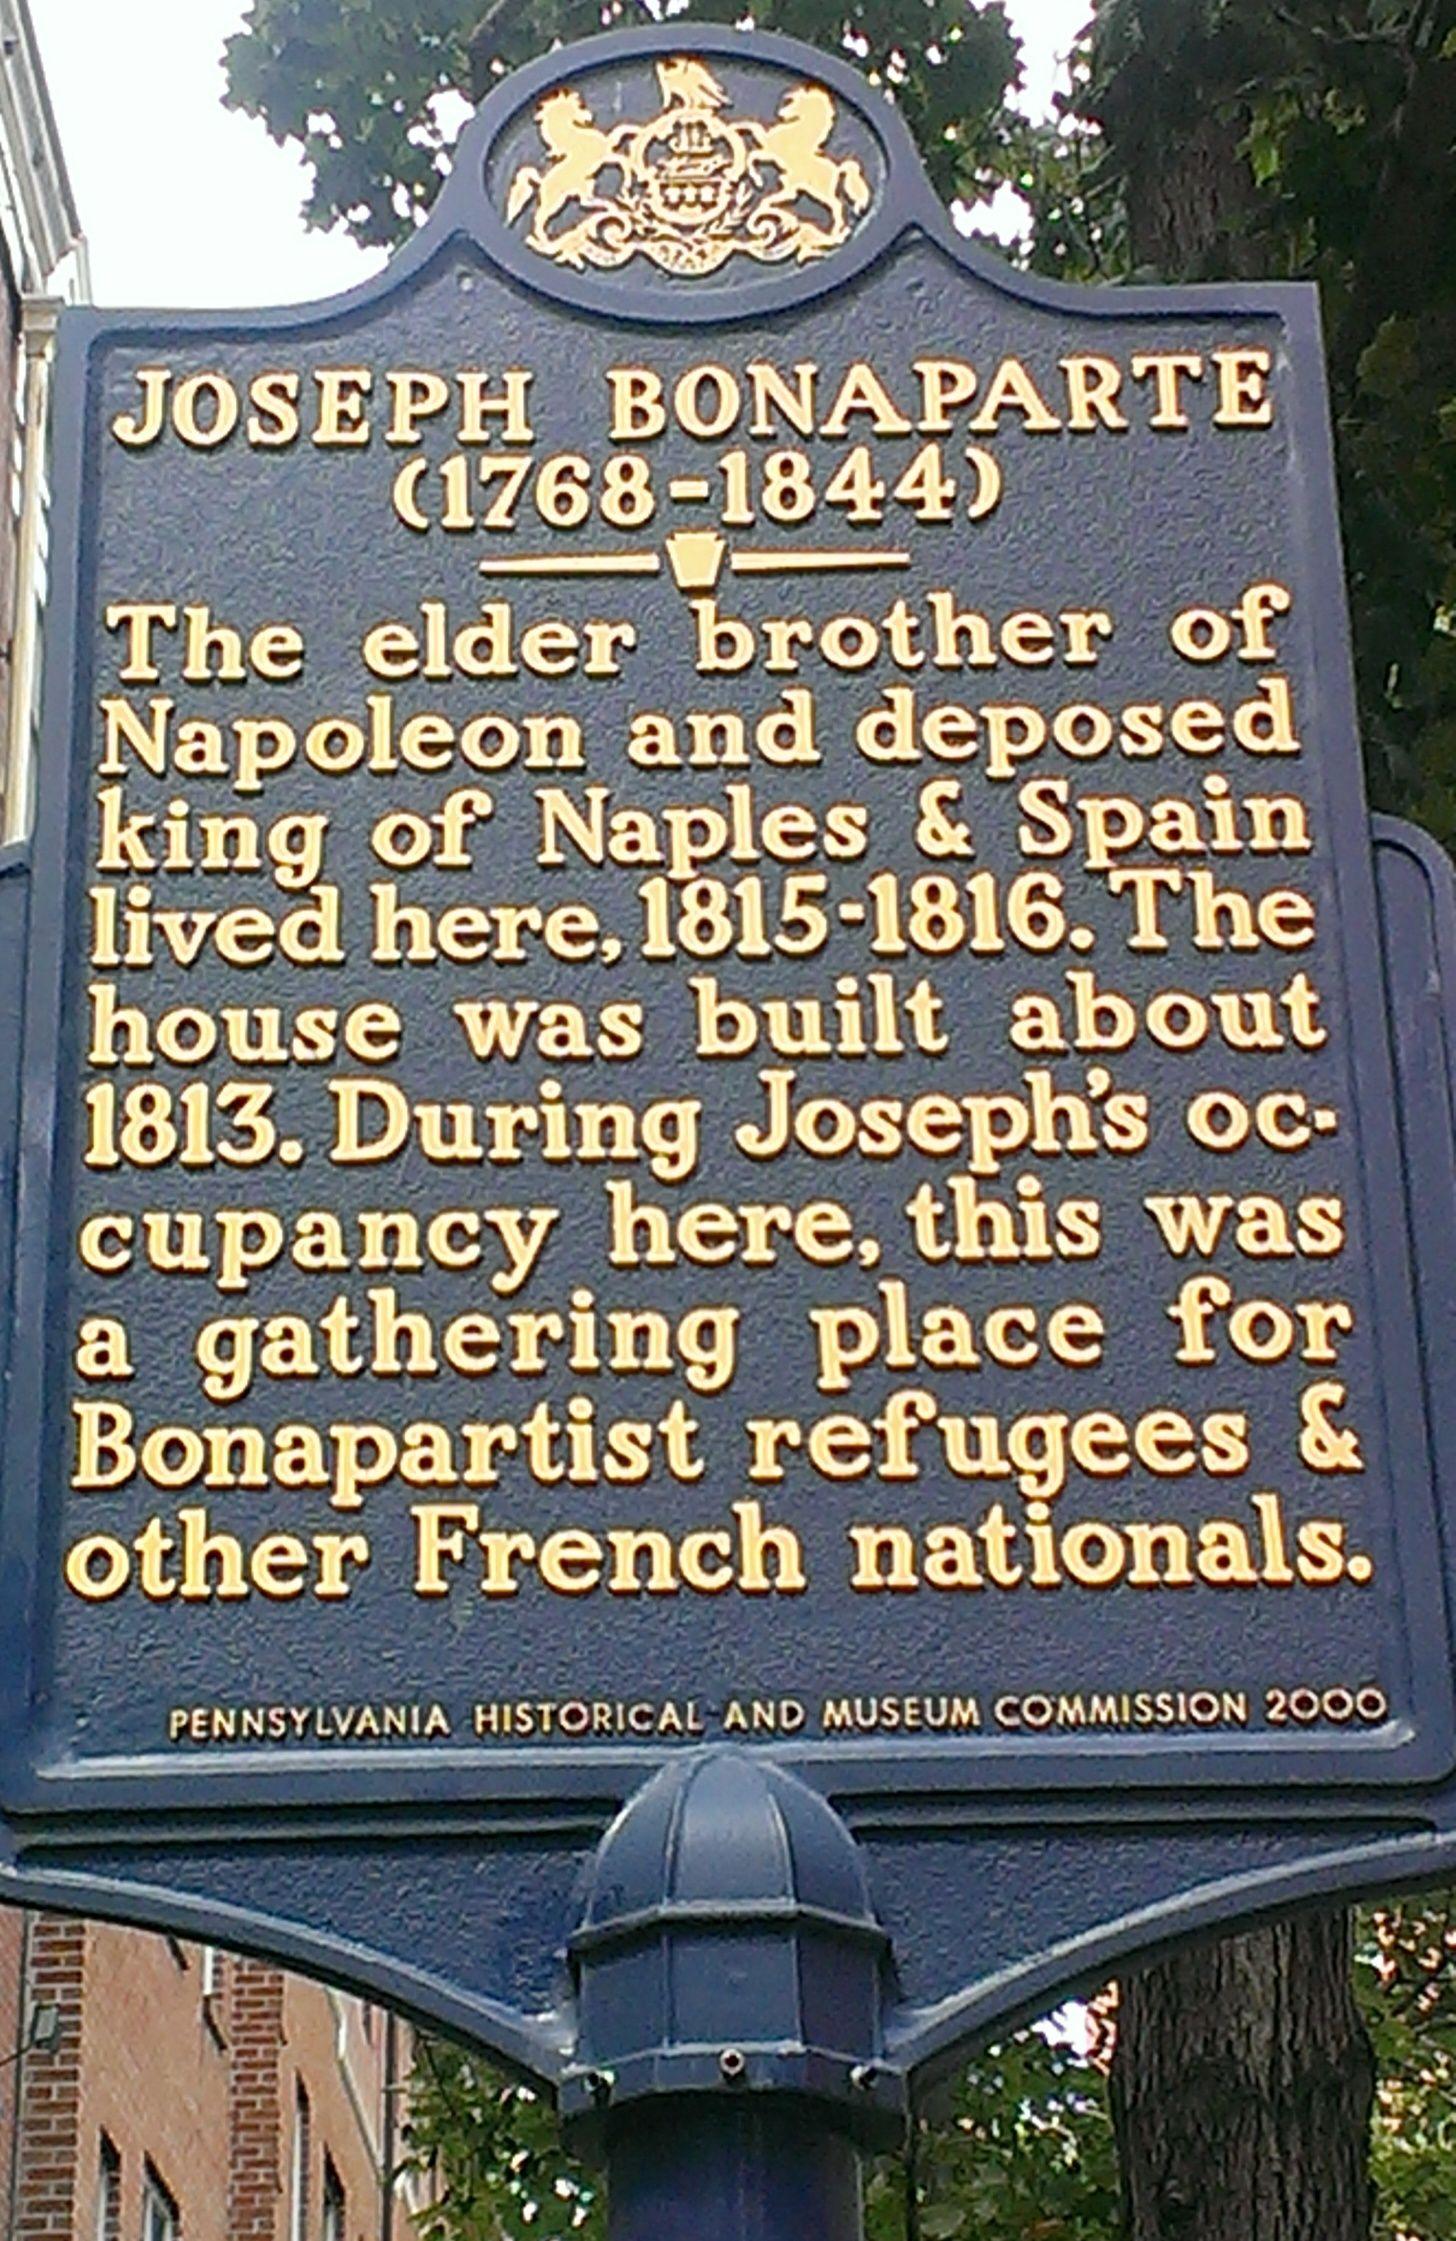 Joseph bonaparte this maker is located on the 200 block